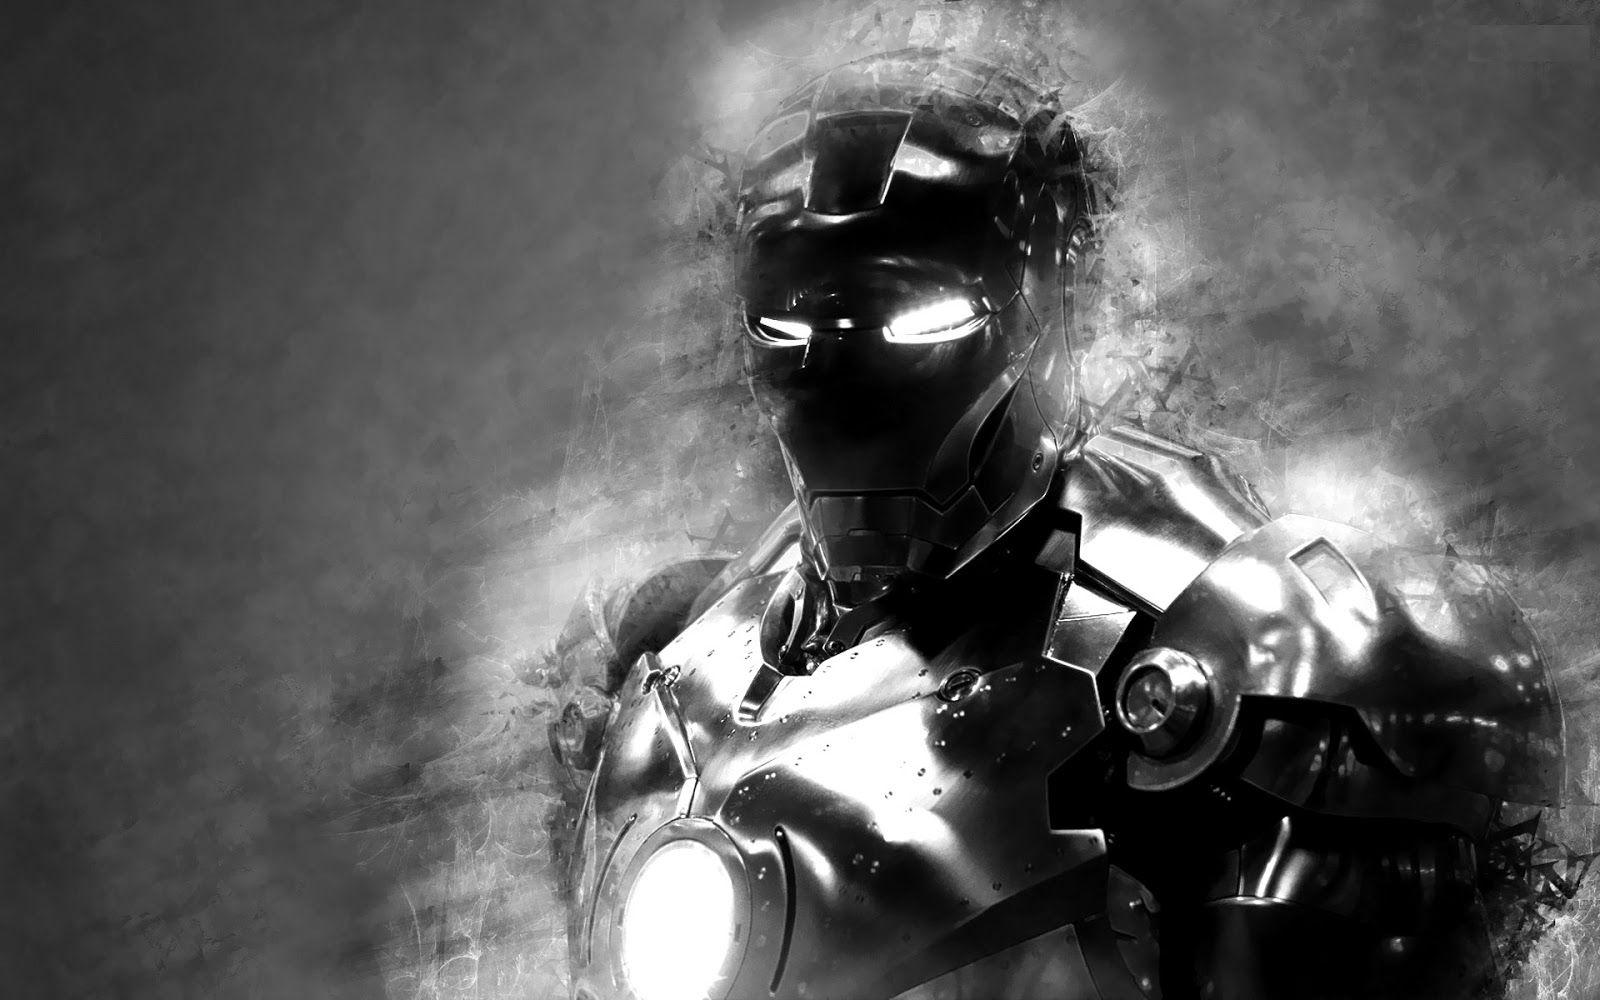 Black and white photography iron man 3 black and white photos